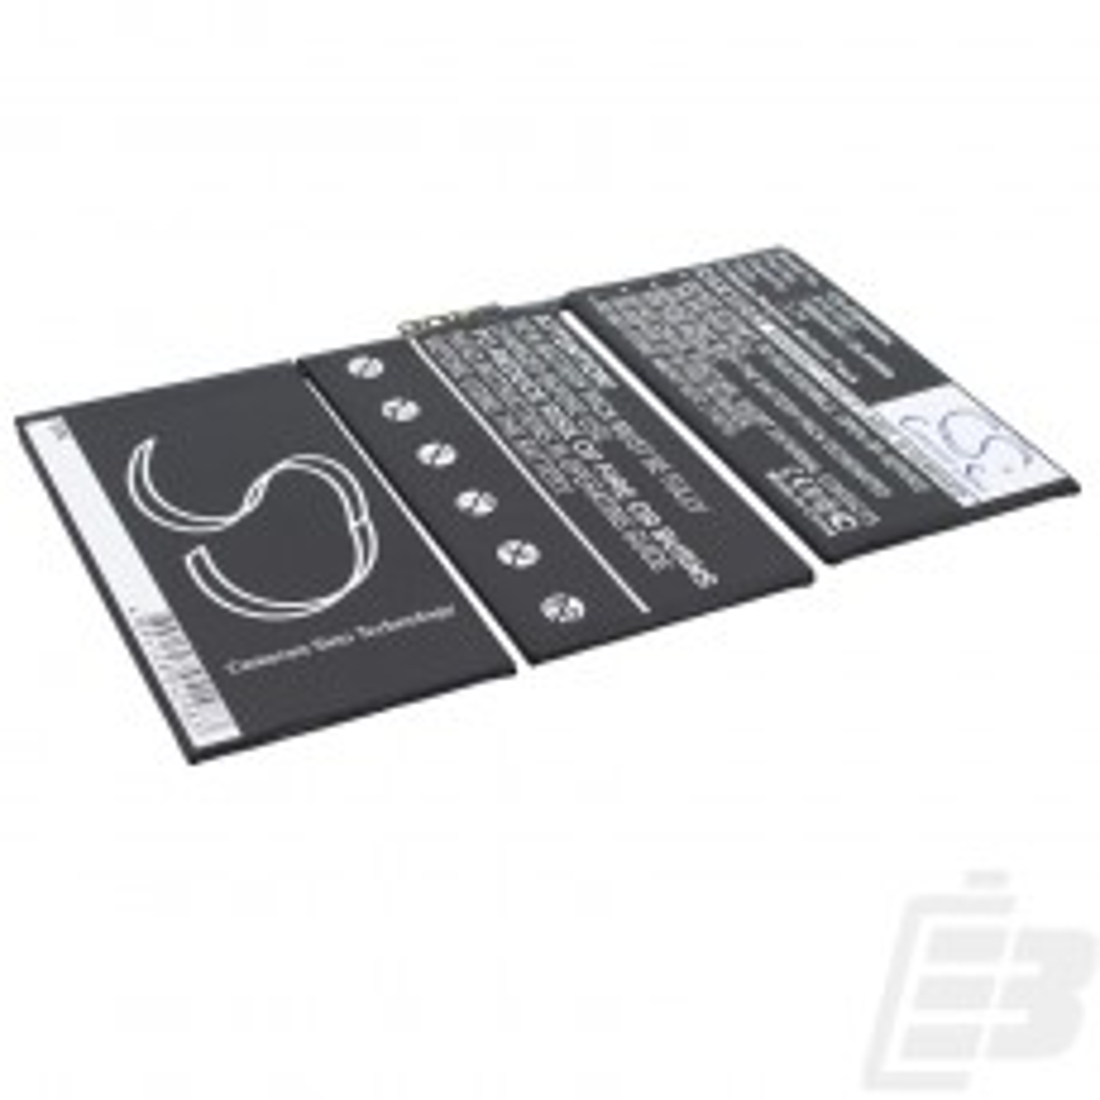 Tablet battery Apple iPad 2_1